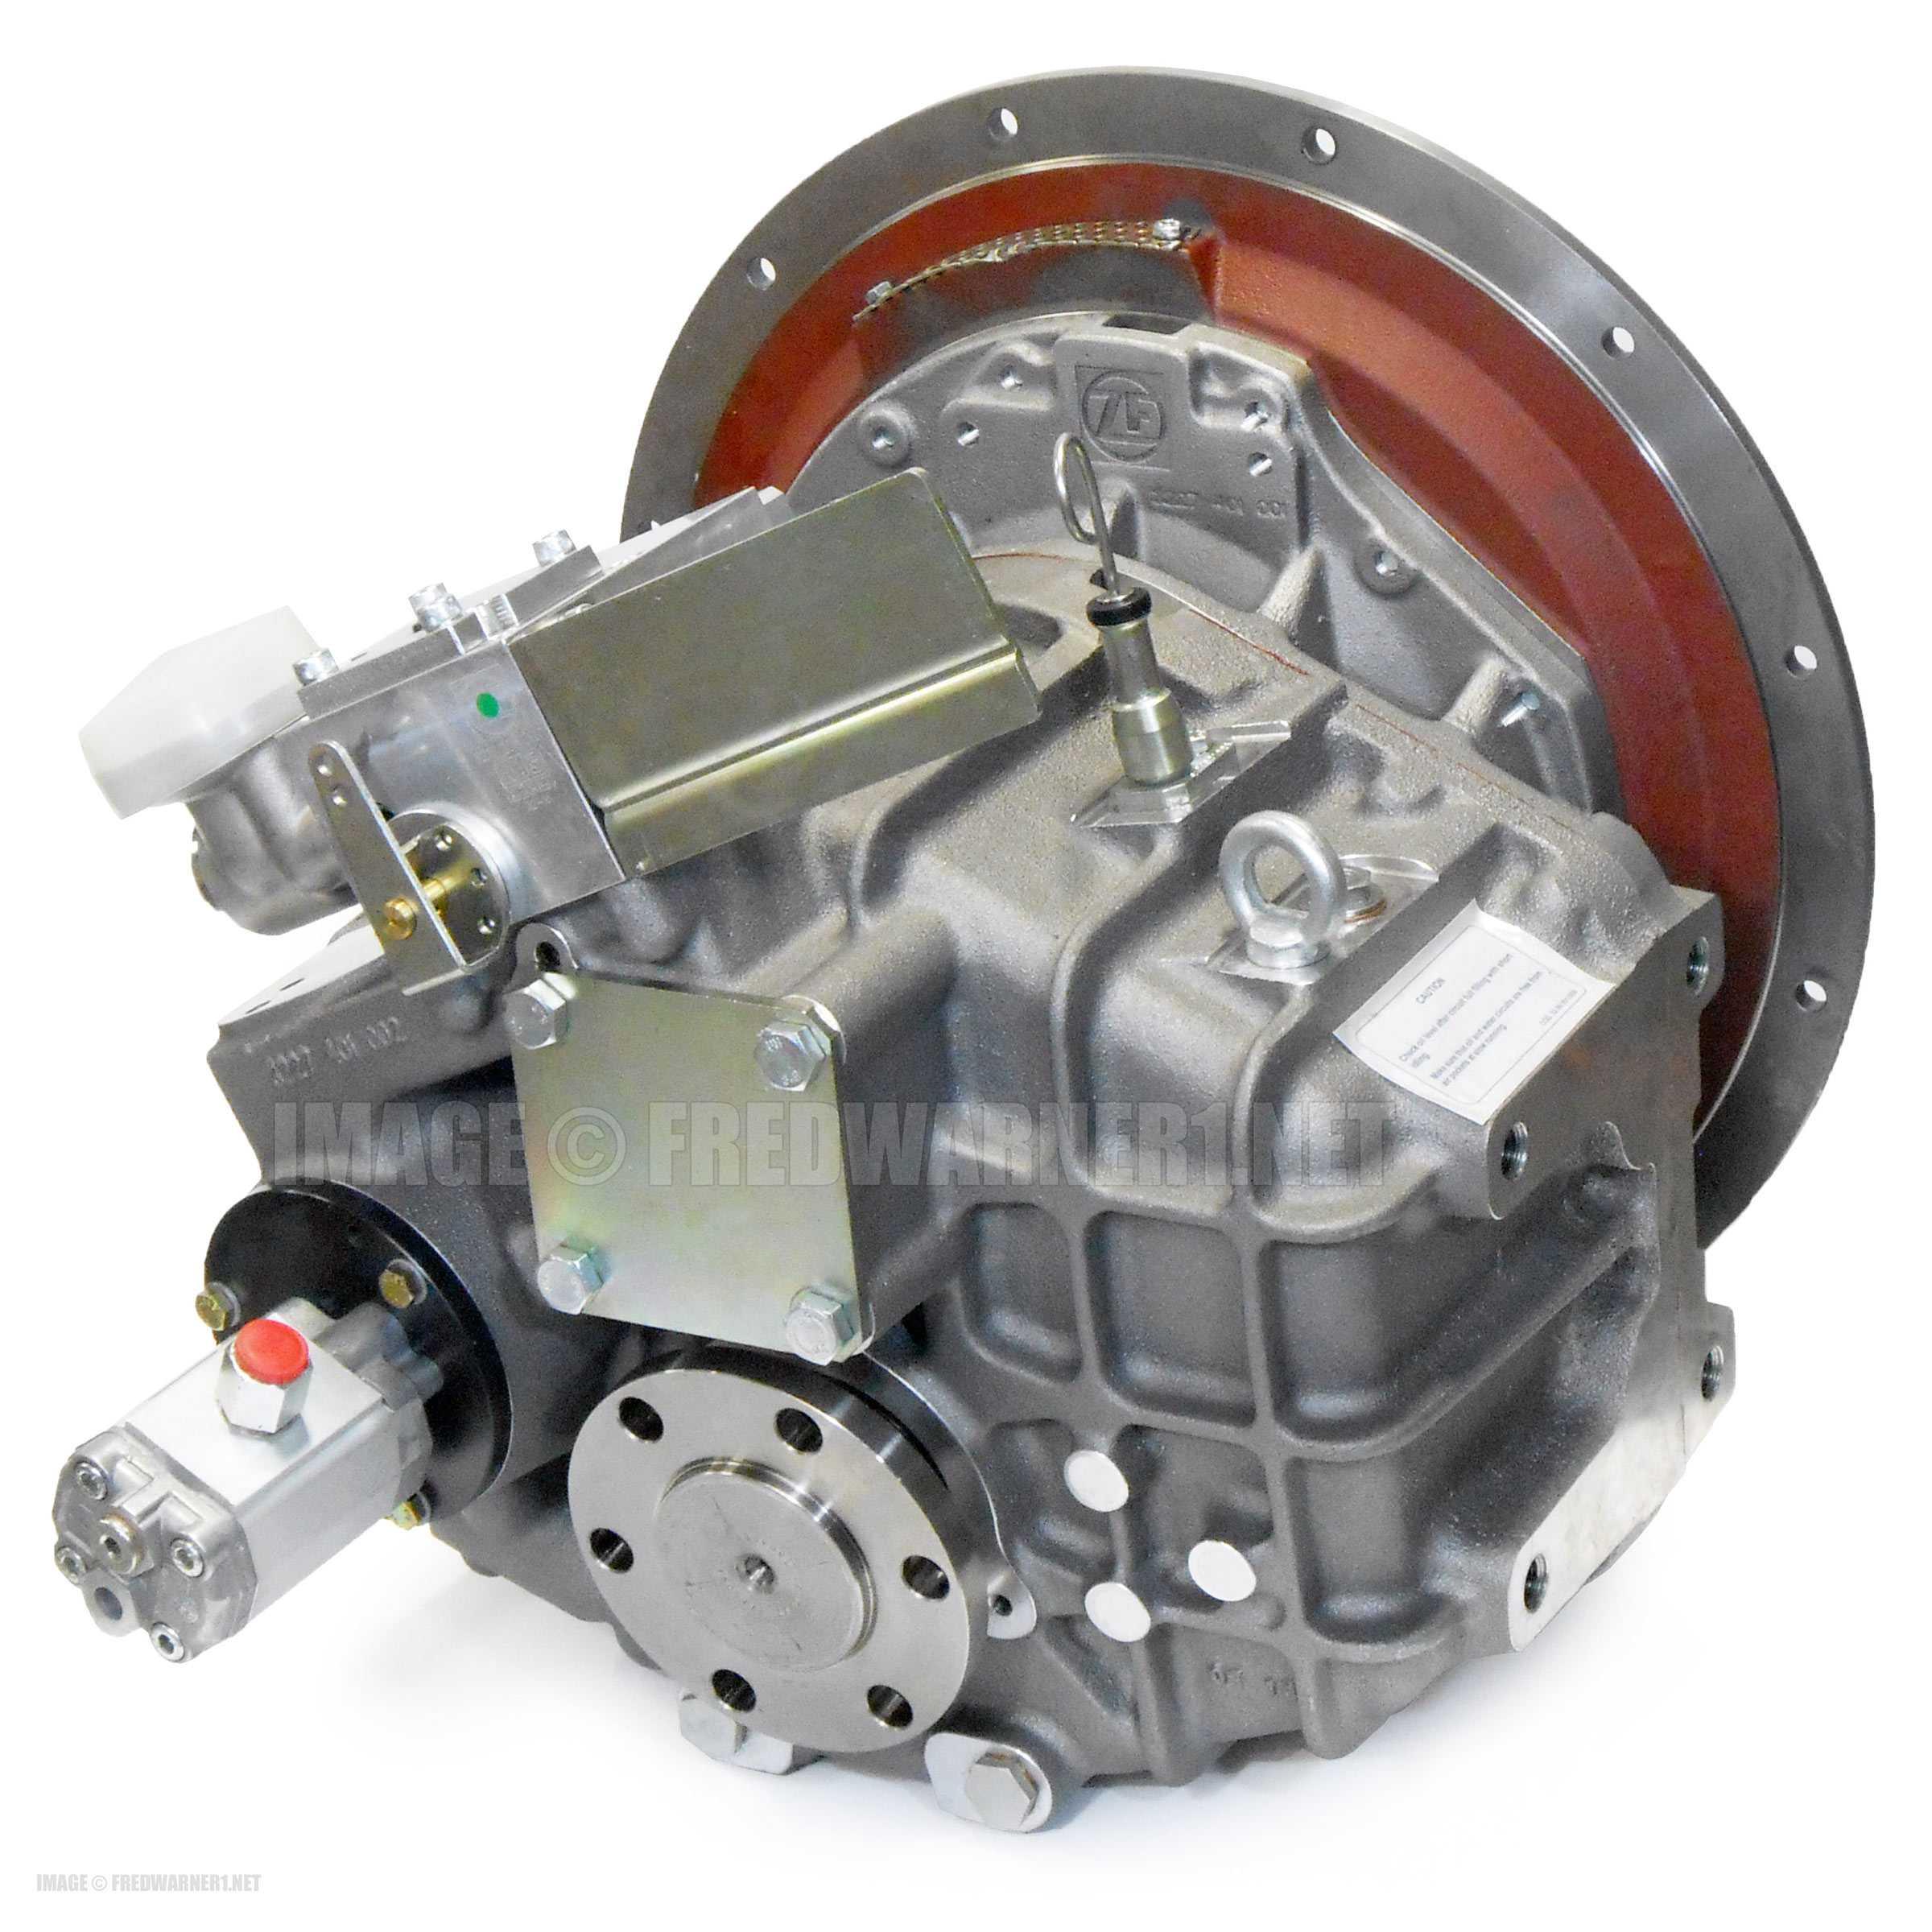 ZF 286A Marine Transmission 1 962:1 Mech Shift CFR SAE 2 Down-Angle  3227004006